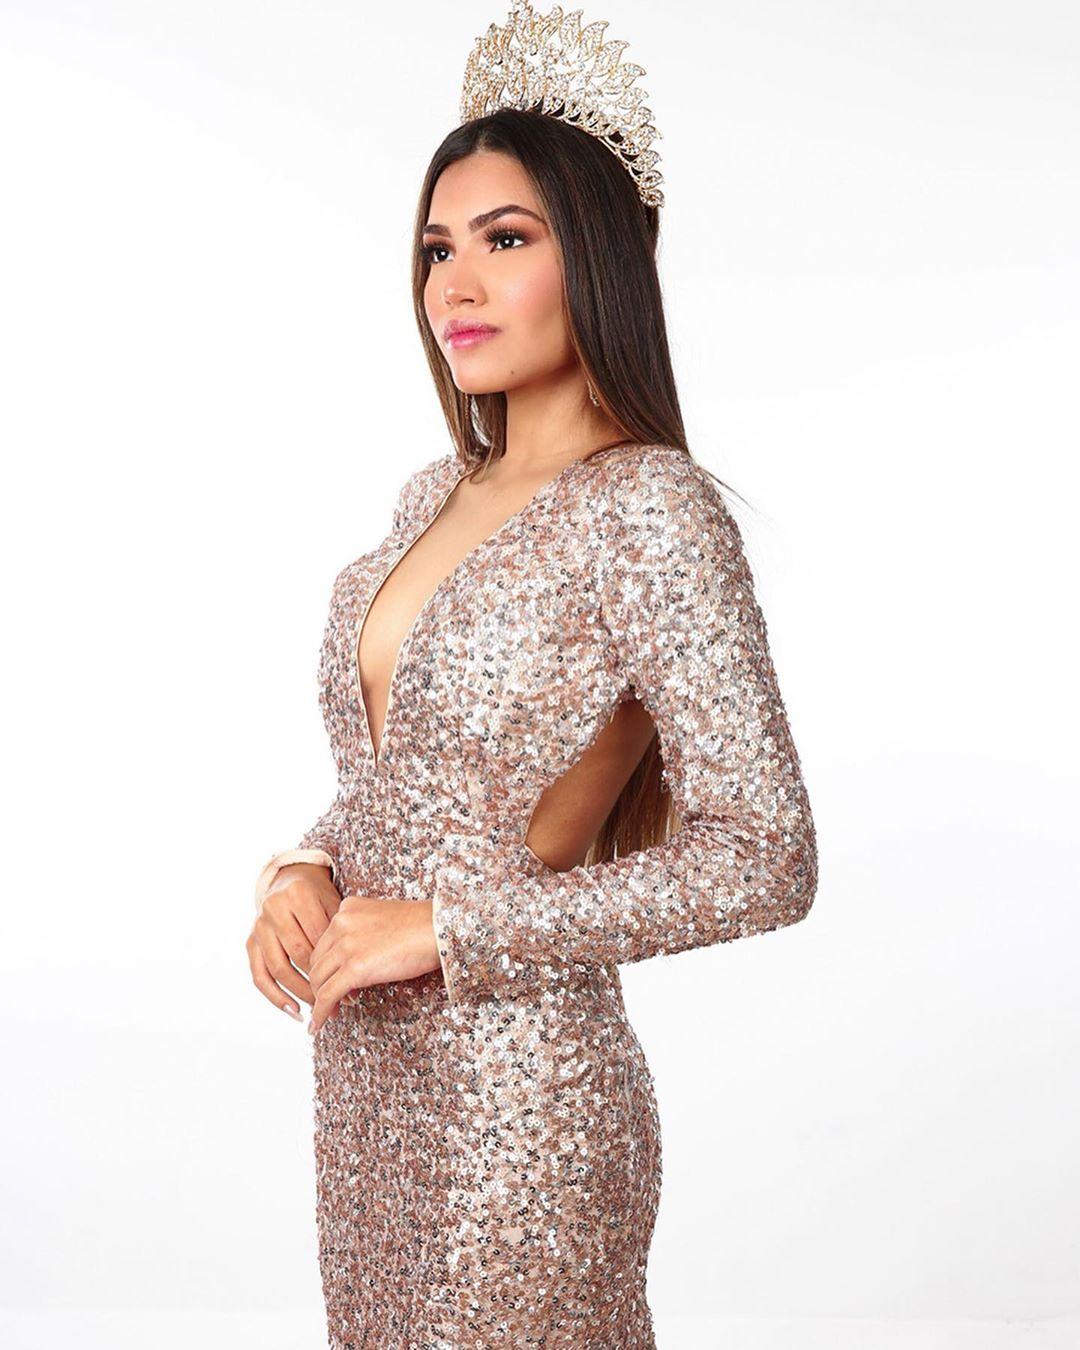 maiza santa rita, top 10 de miss brasil mundo 2019. 67098410